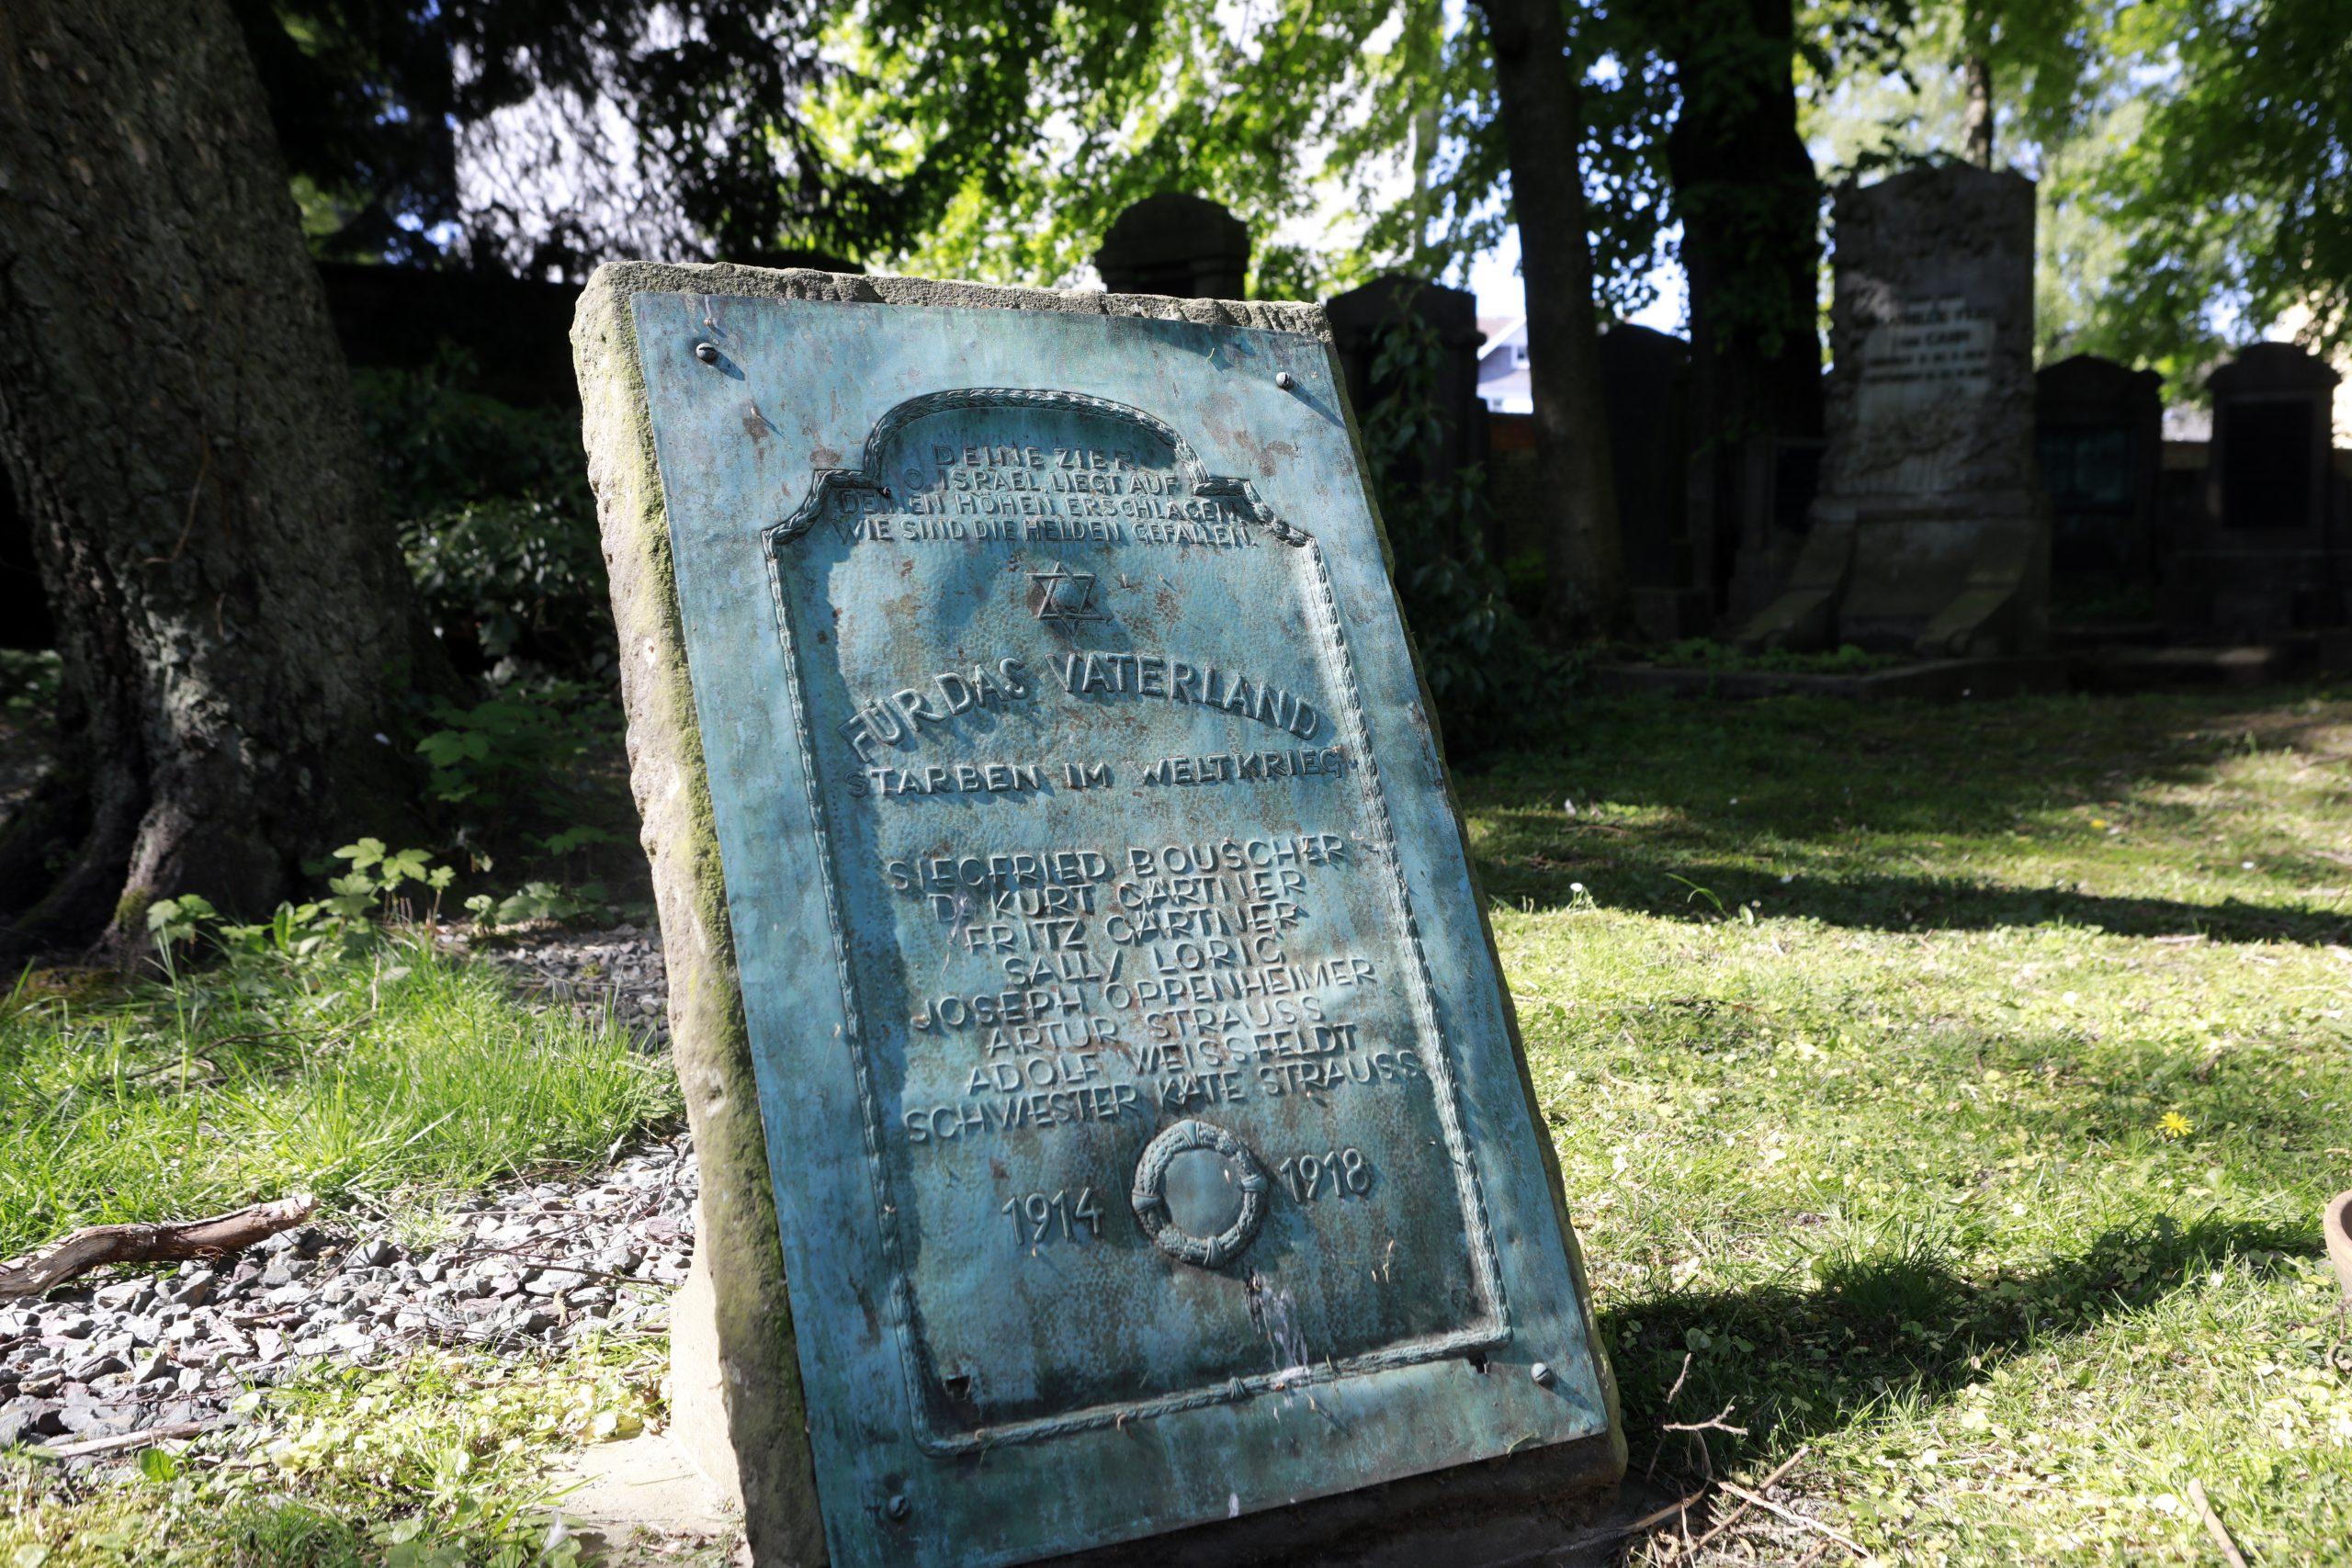 Memorial stone for the fallen